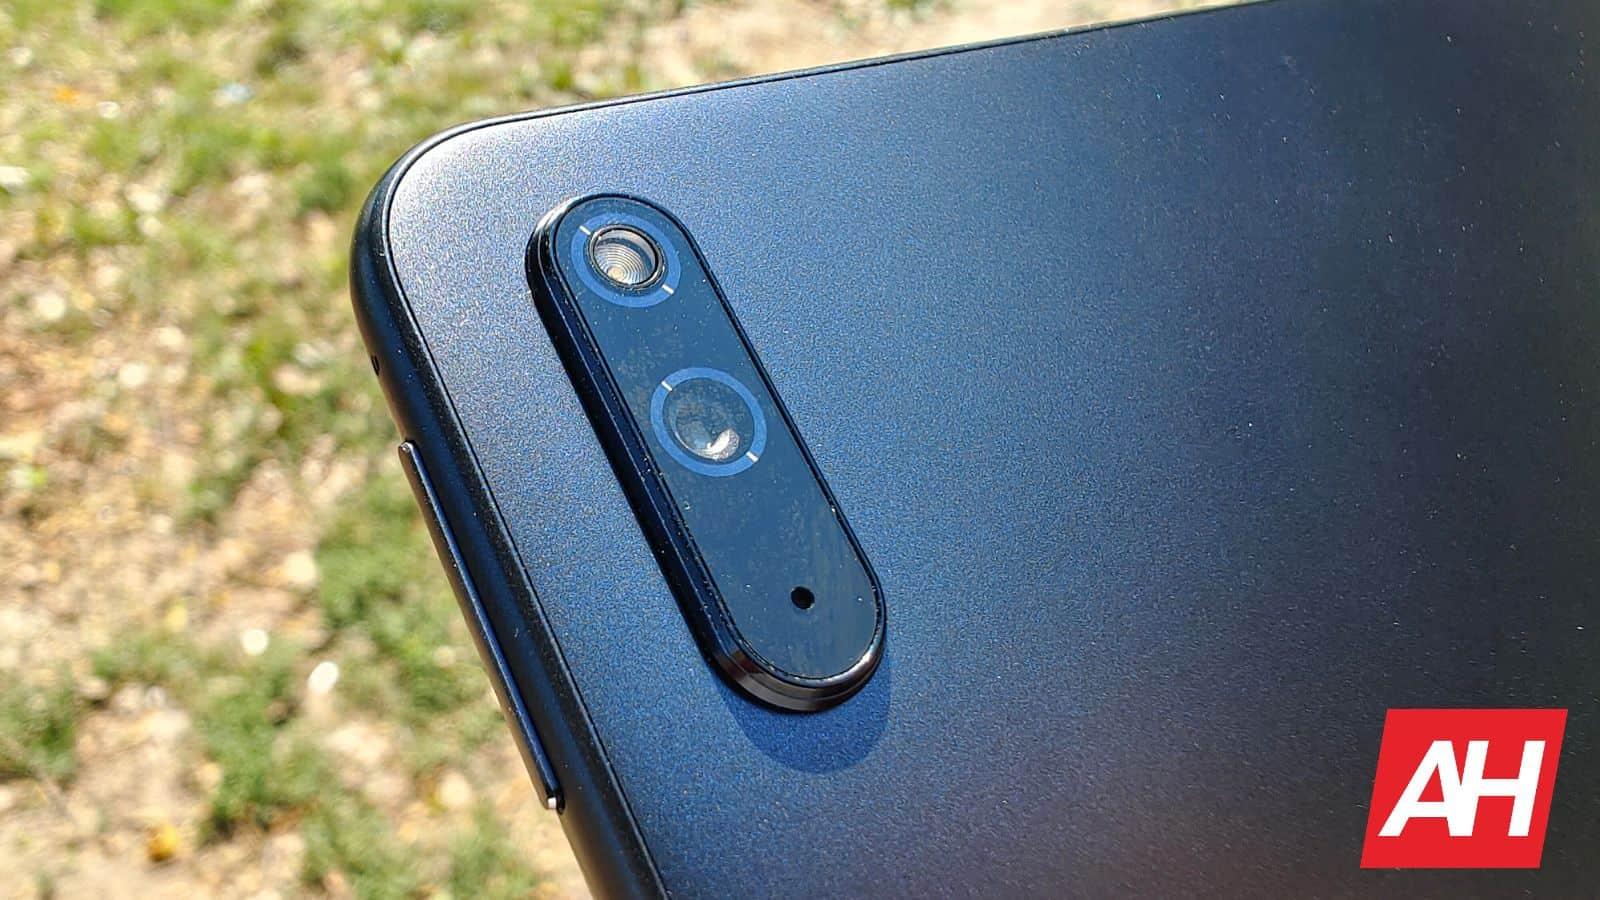 AH Huawei MatePad 11 image 35